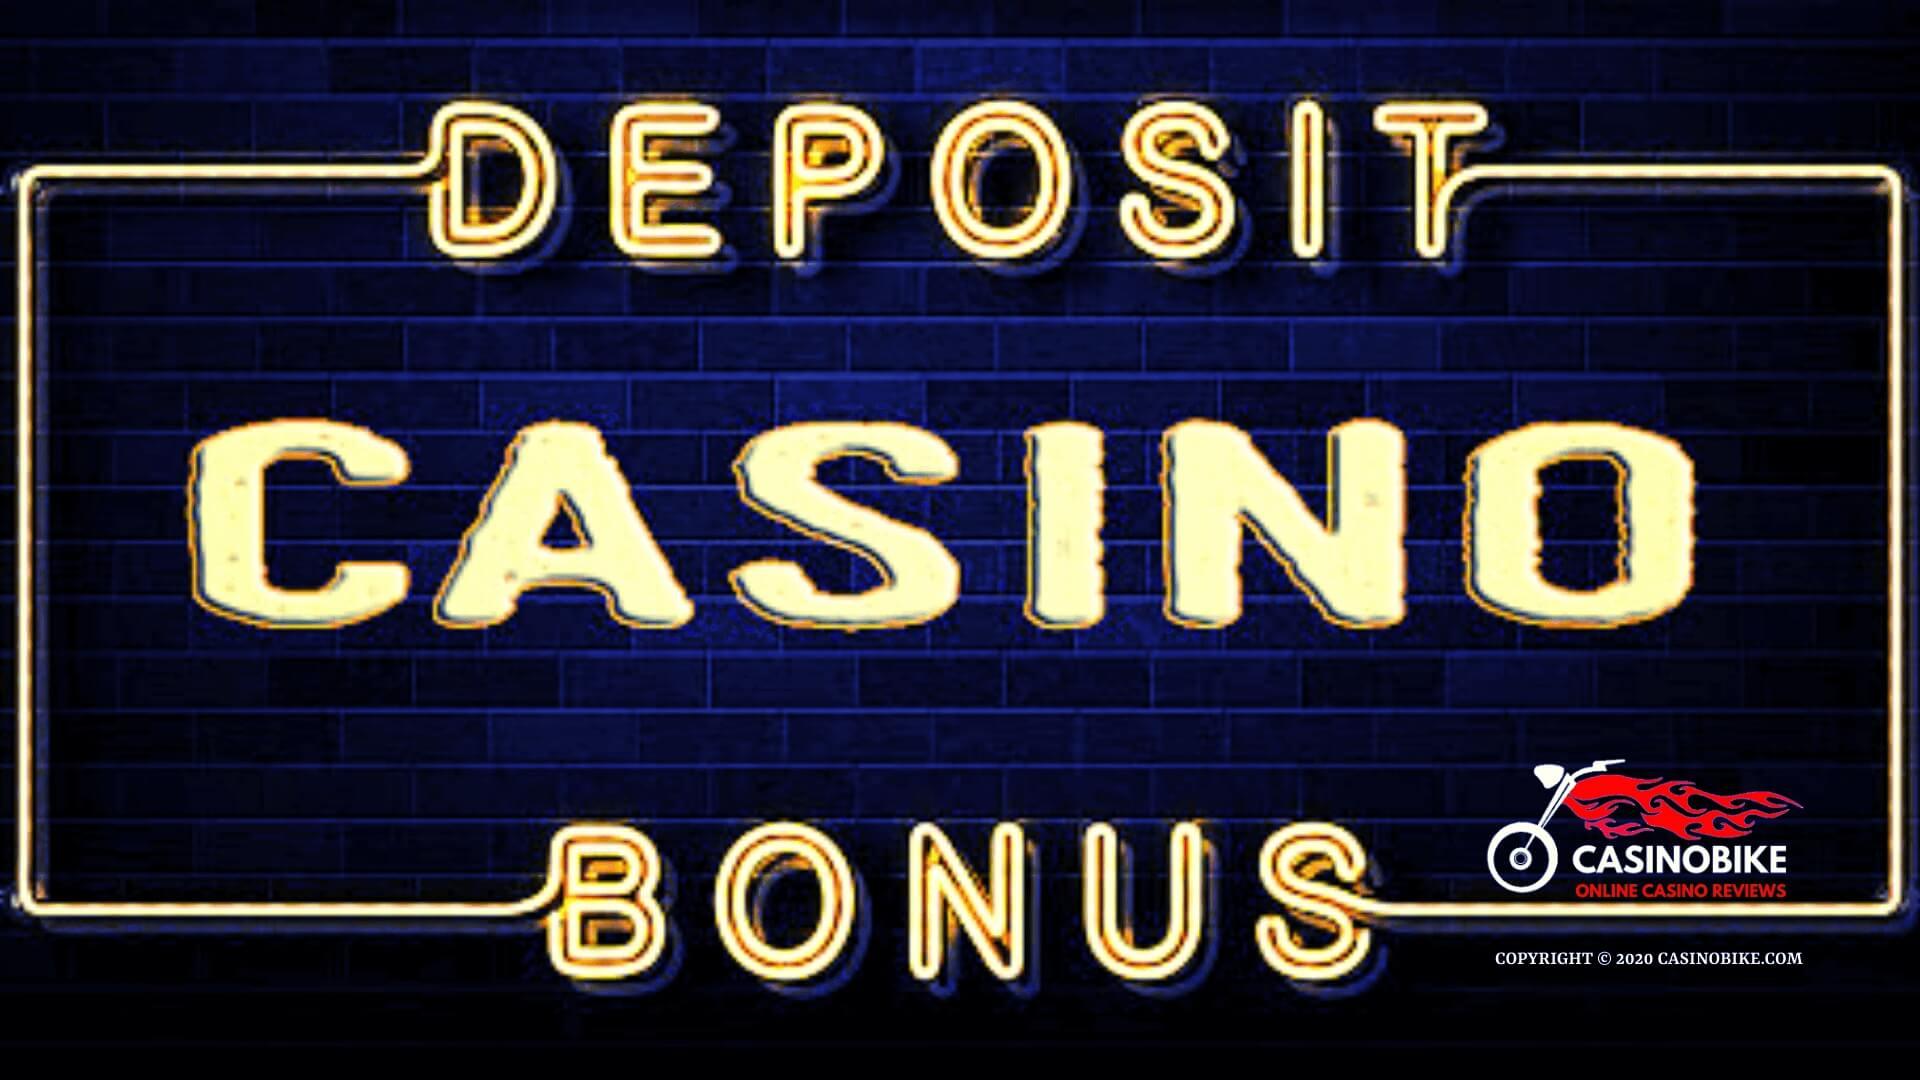 Best Online Casino Deposit Bonuses